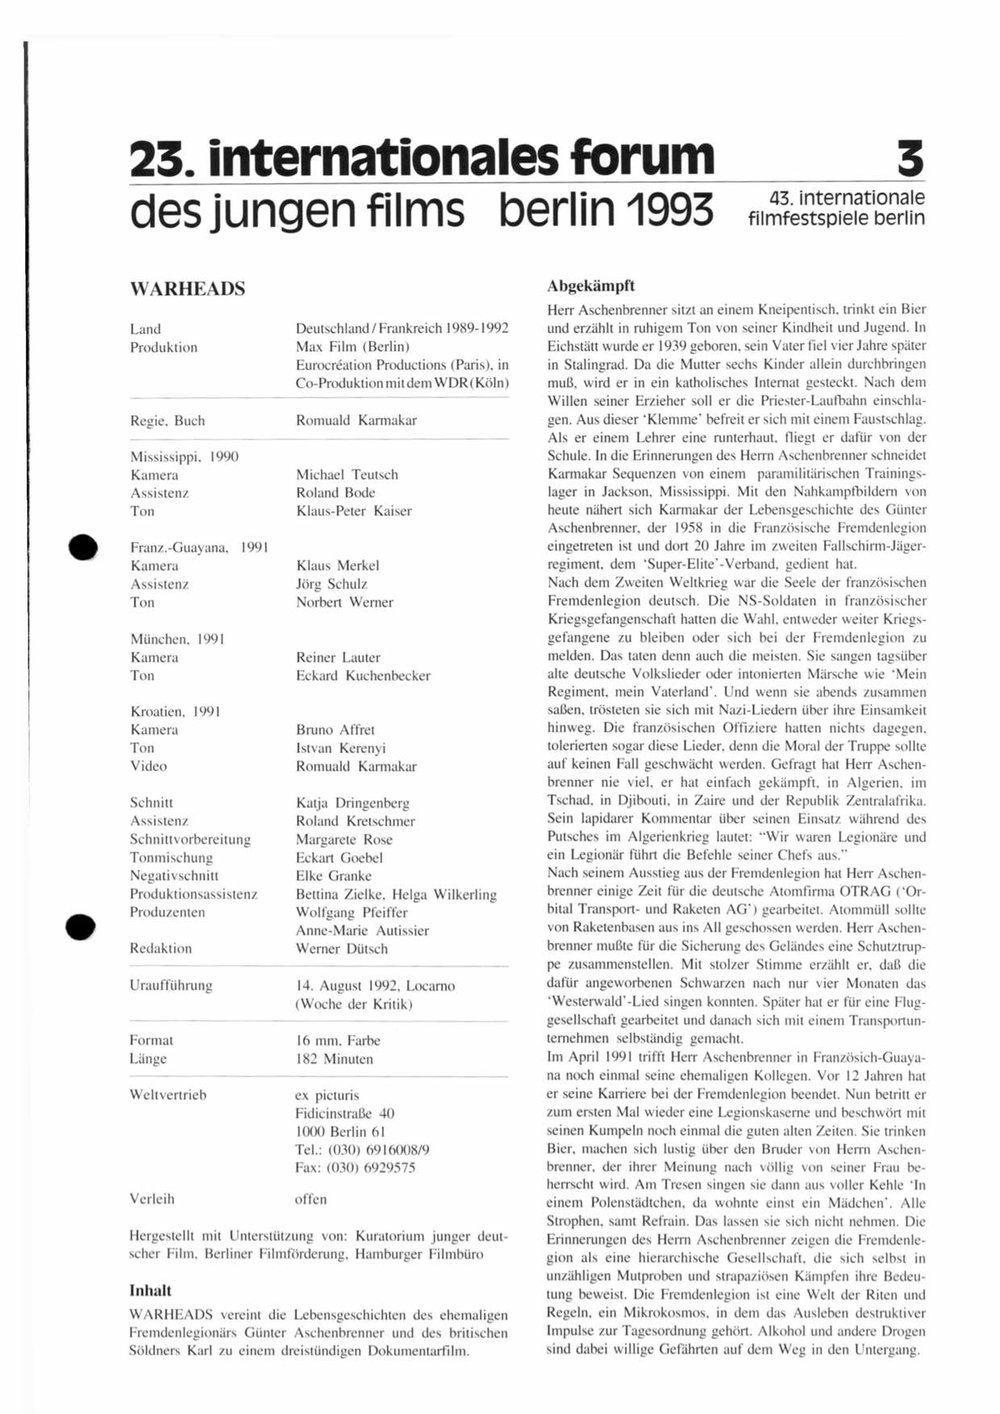 WARHEADS / BERLINALE 1993